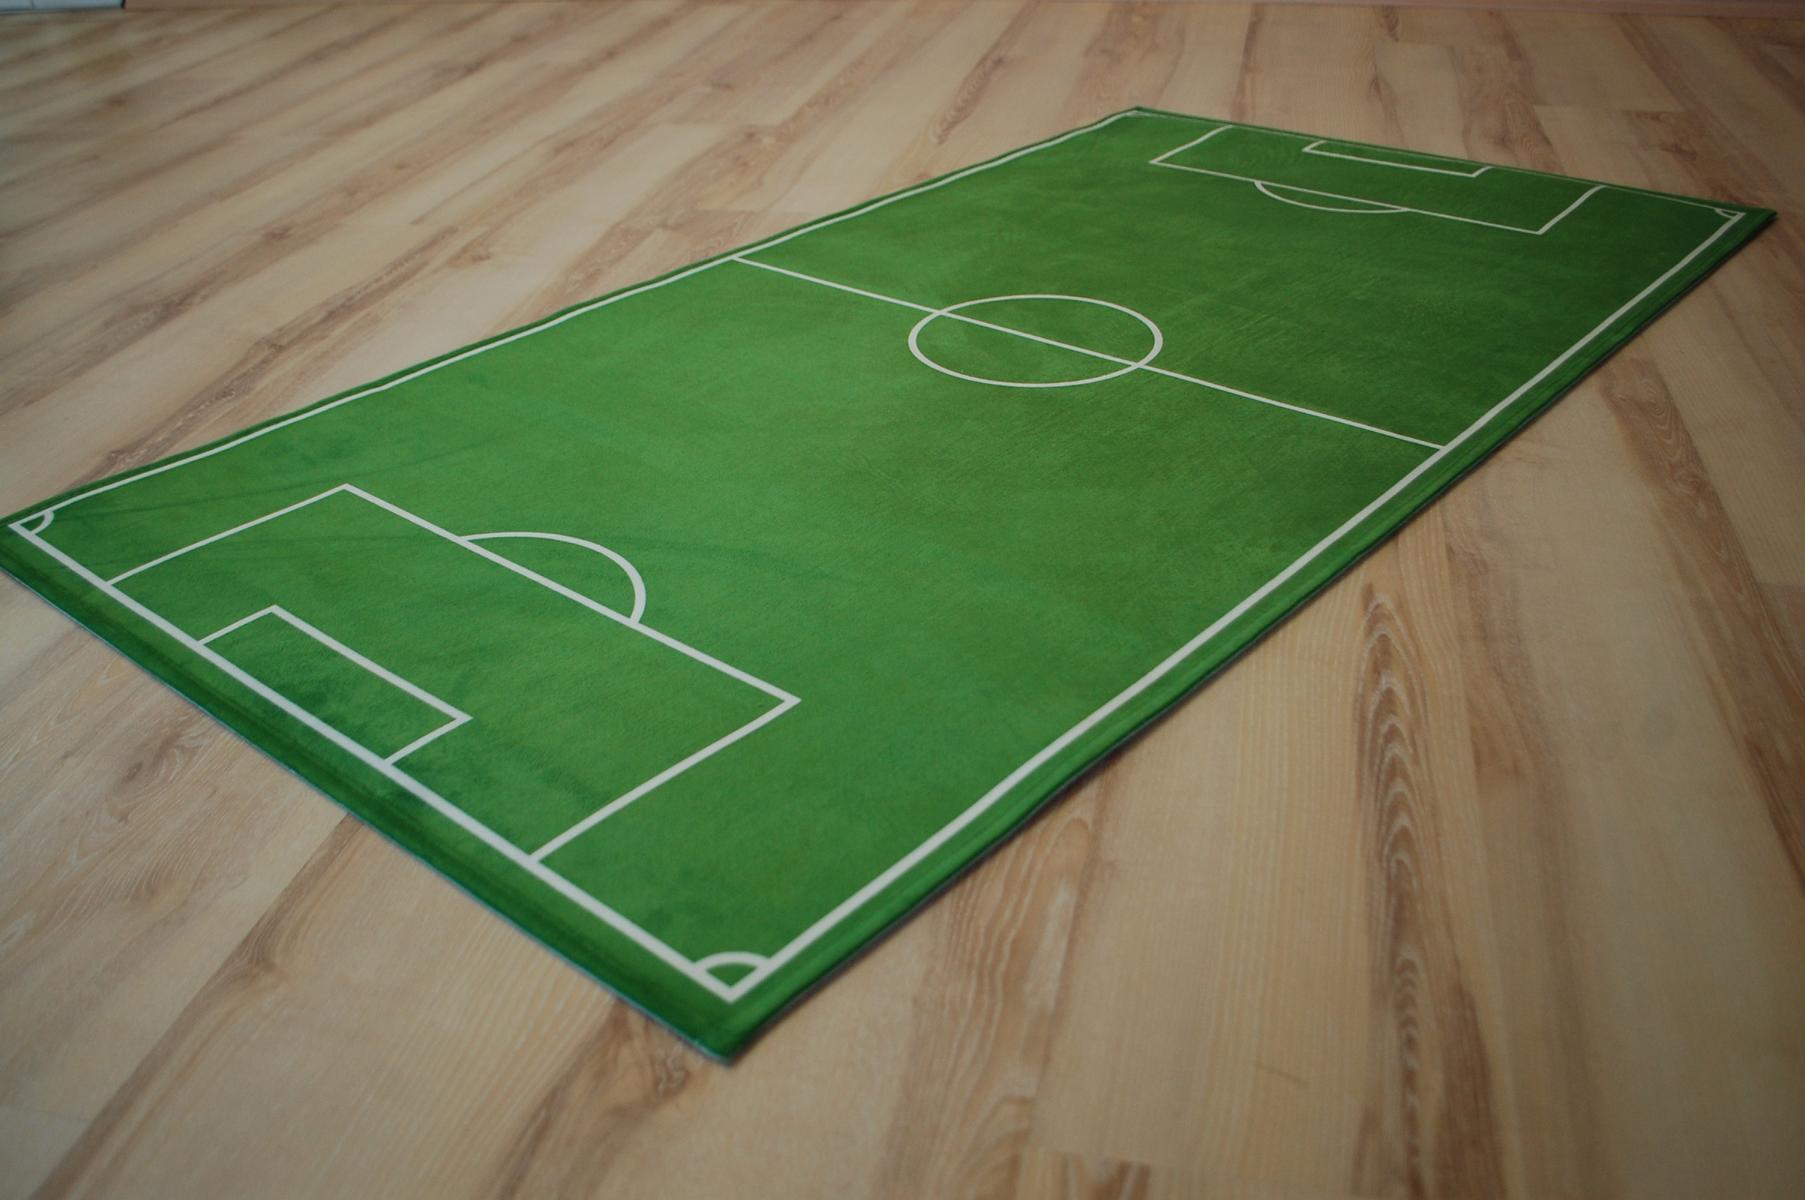 campo ni os alfombra de juego f tbol 80x150 cm lk 414 On alfombra campo futbol hipercor